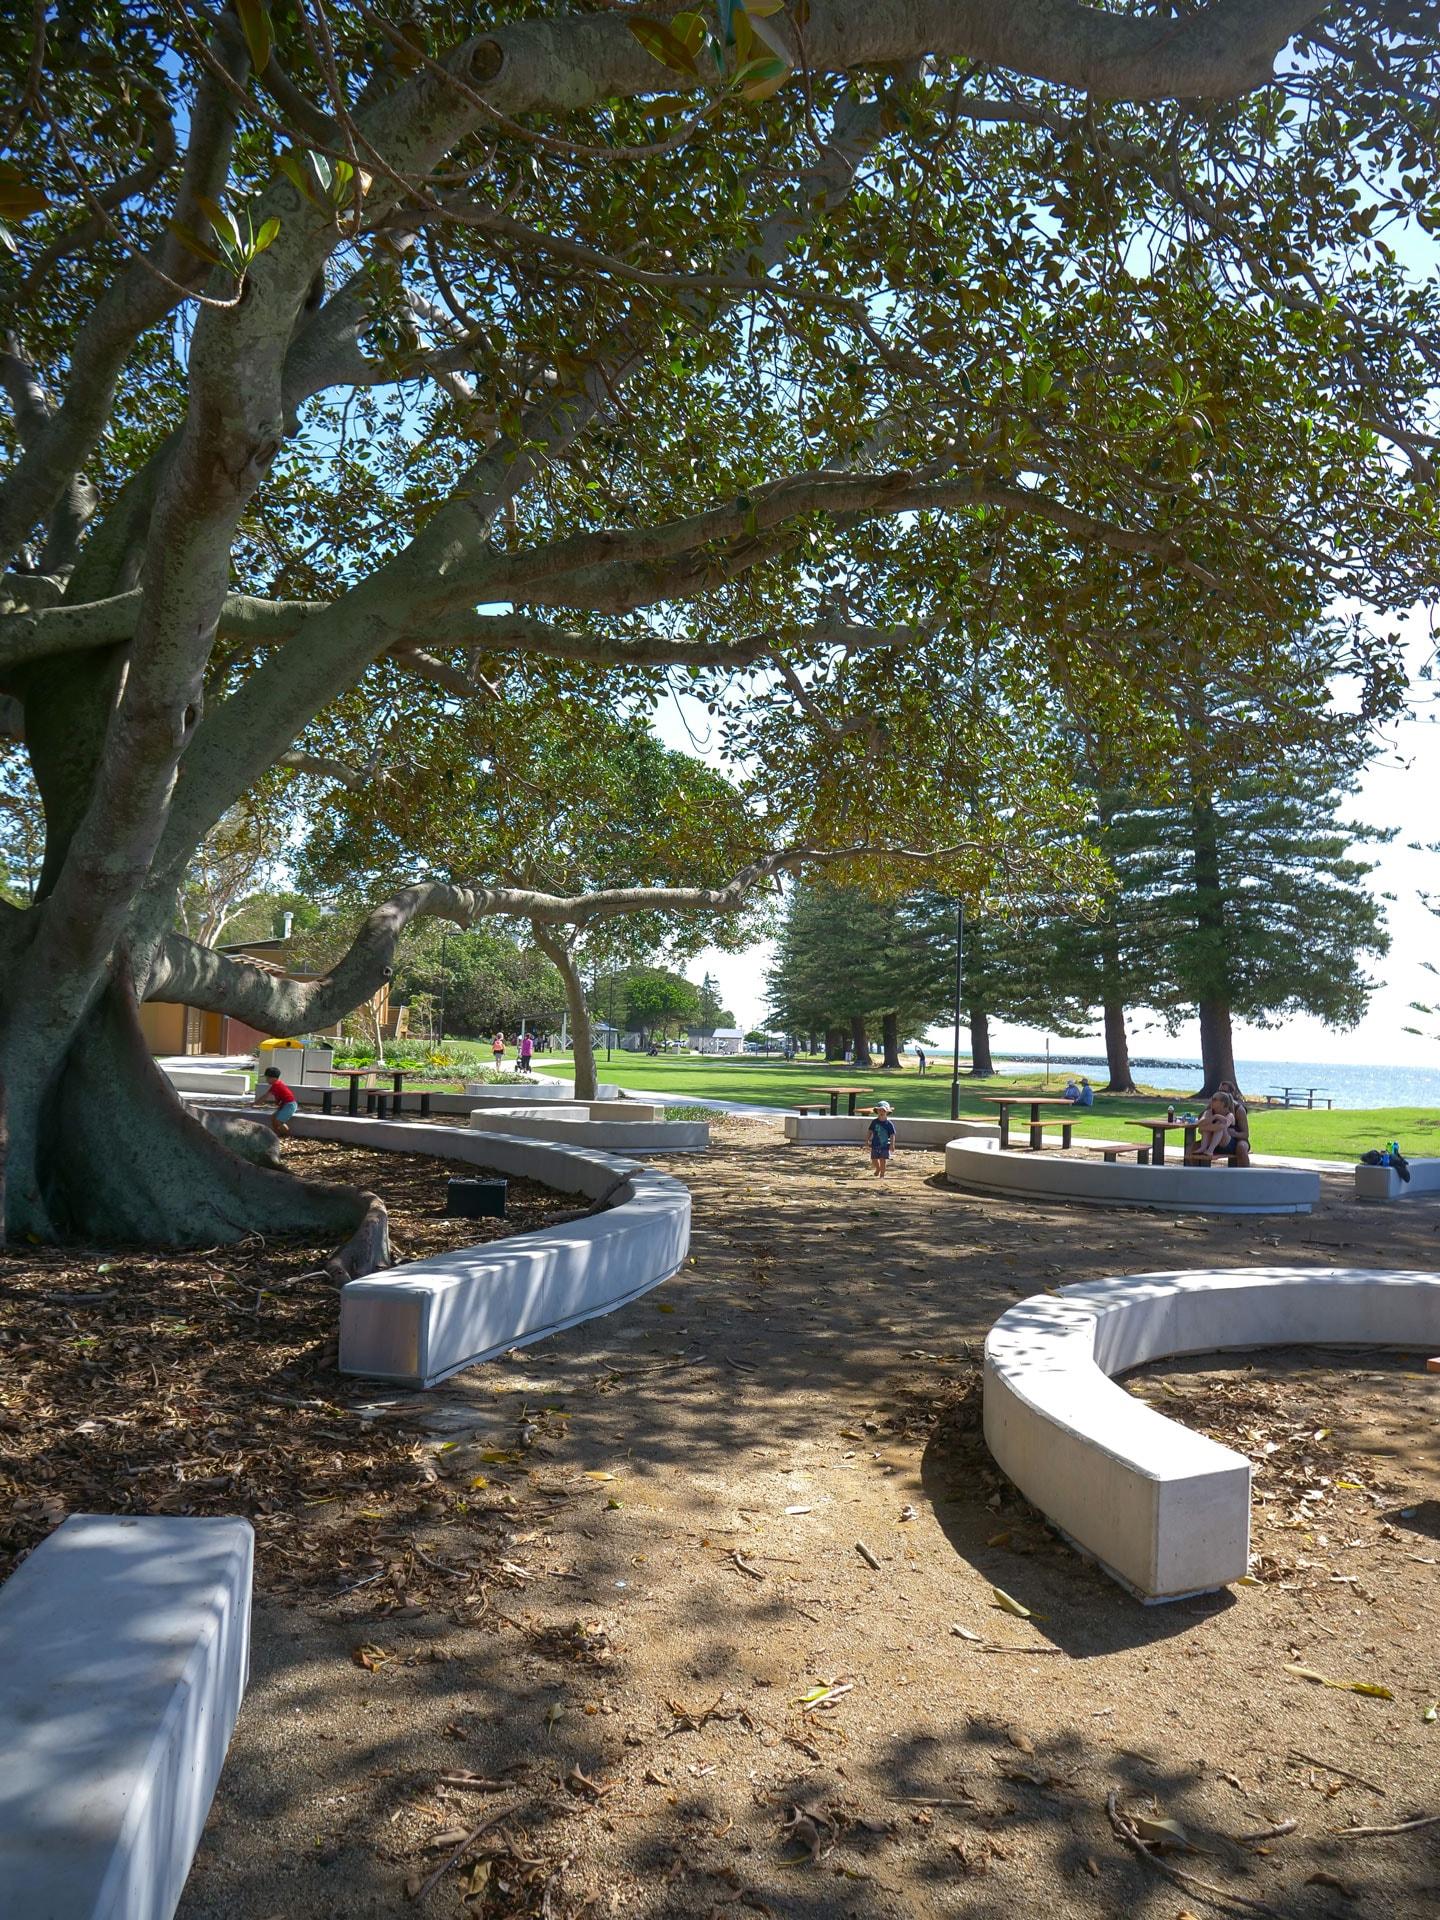 12.-Scarborough-Beach-Park-P1044614.jpg